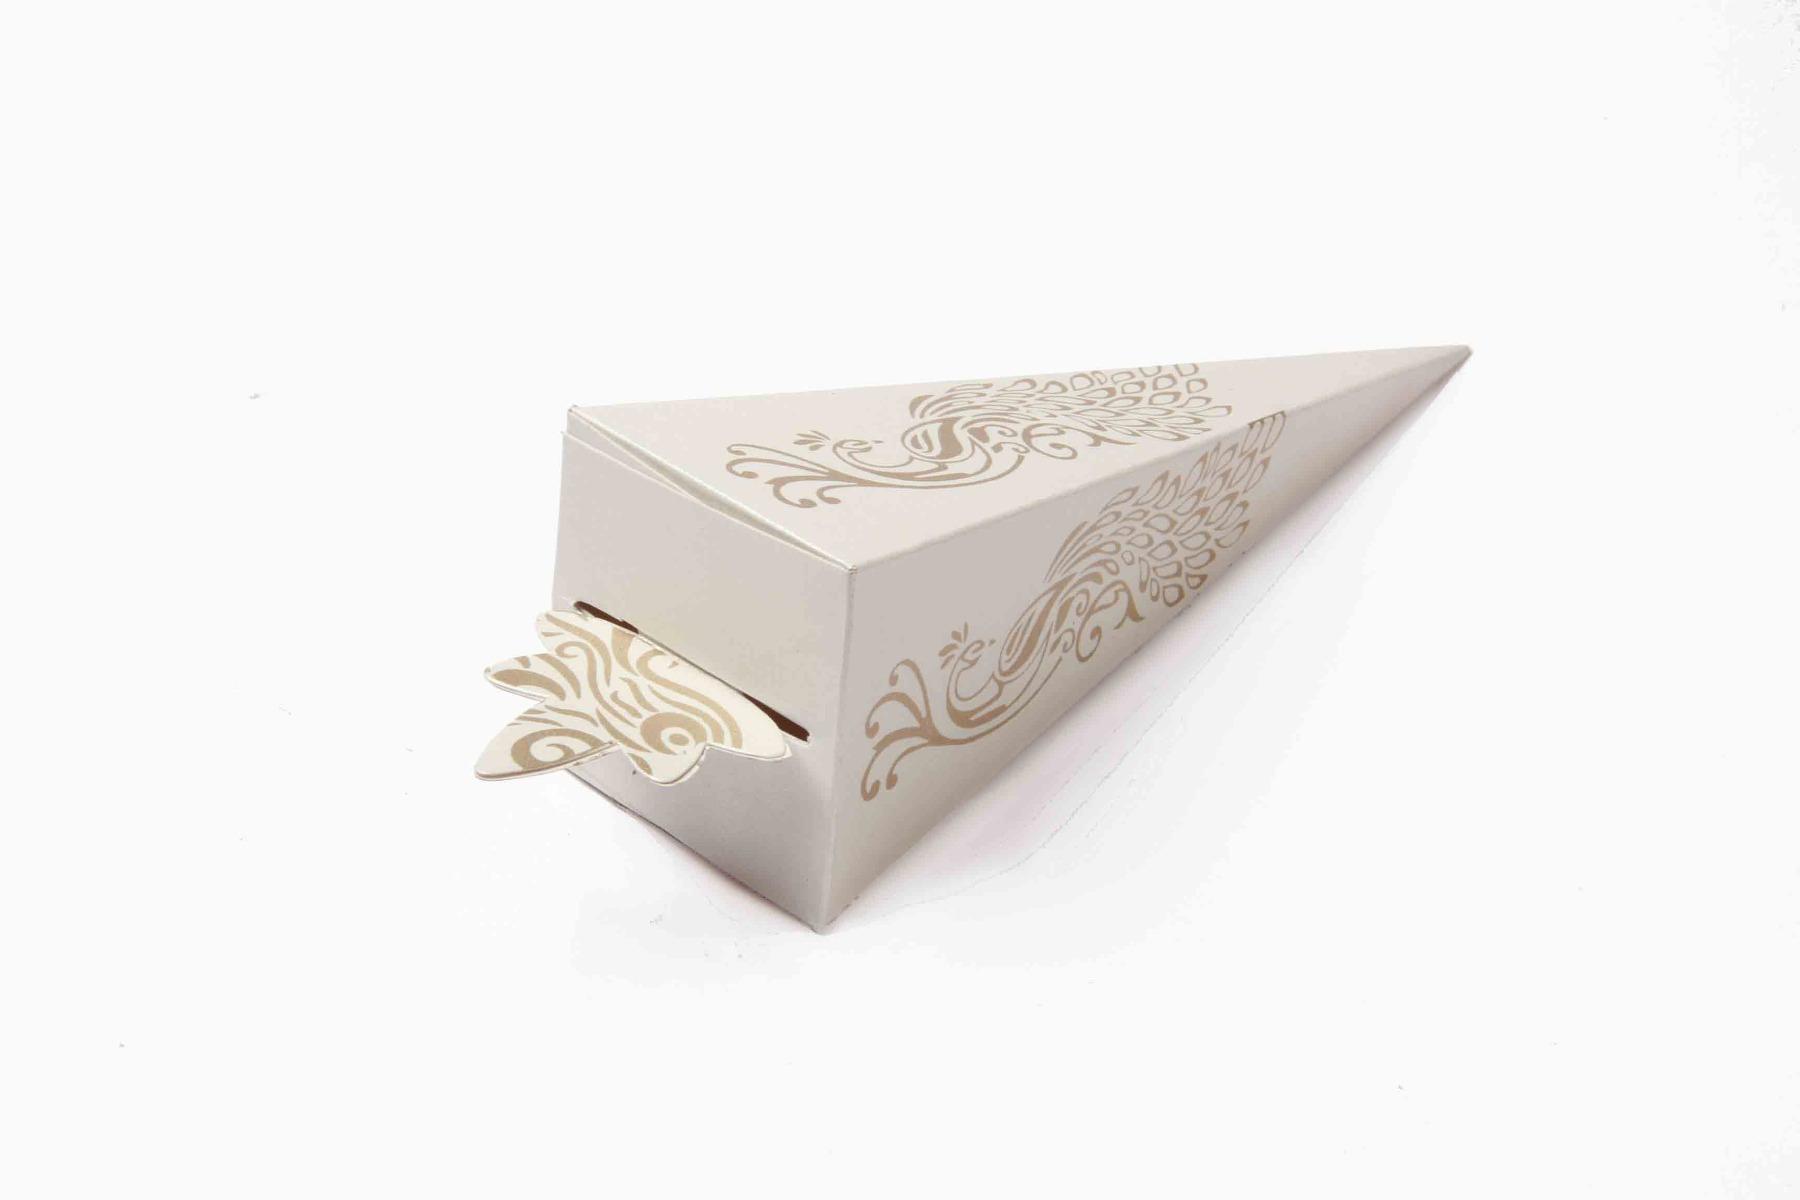 Cone Shaped Favor Box No 8 - White-8615